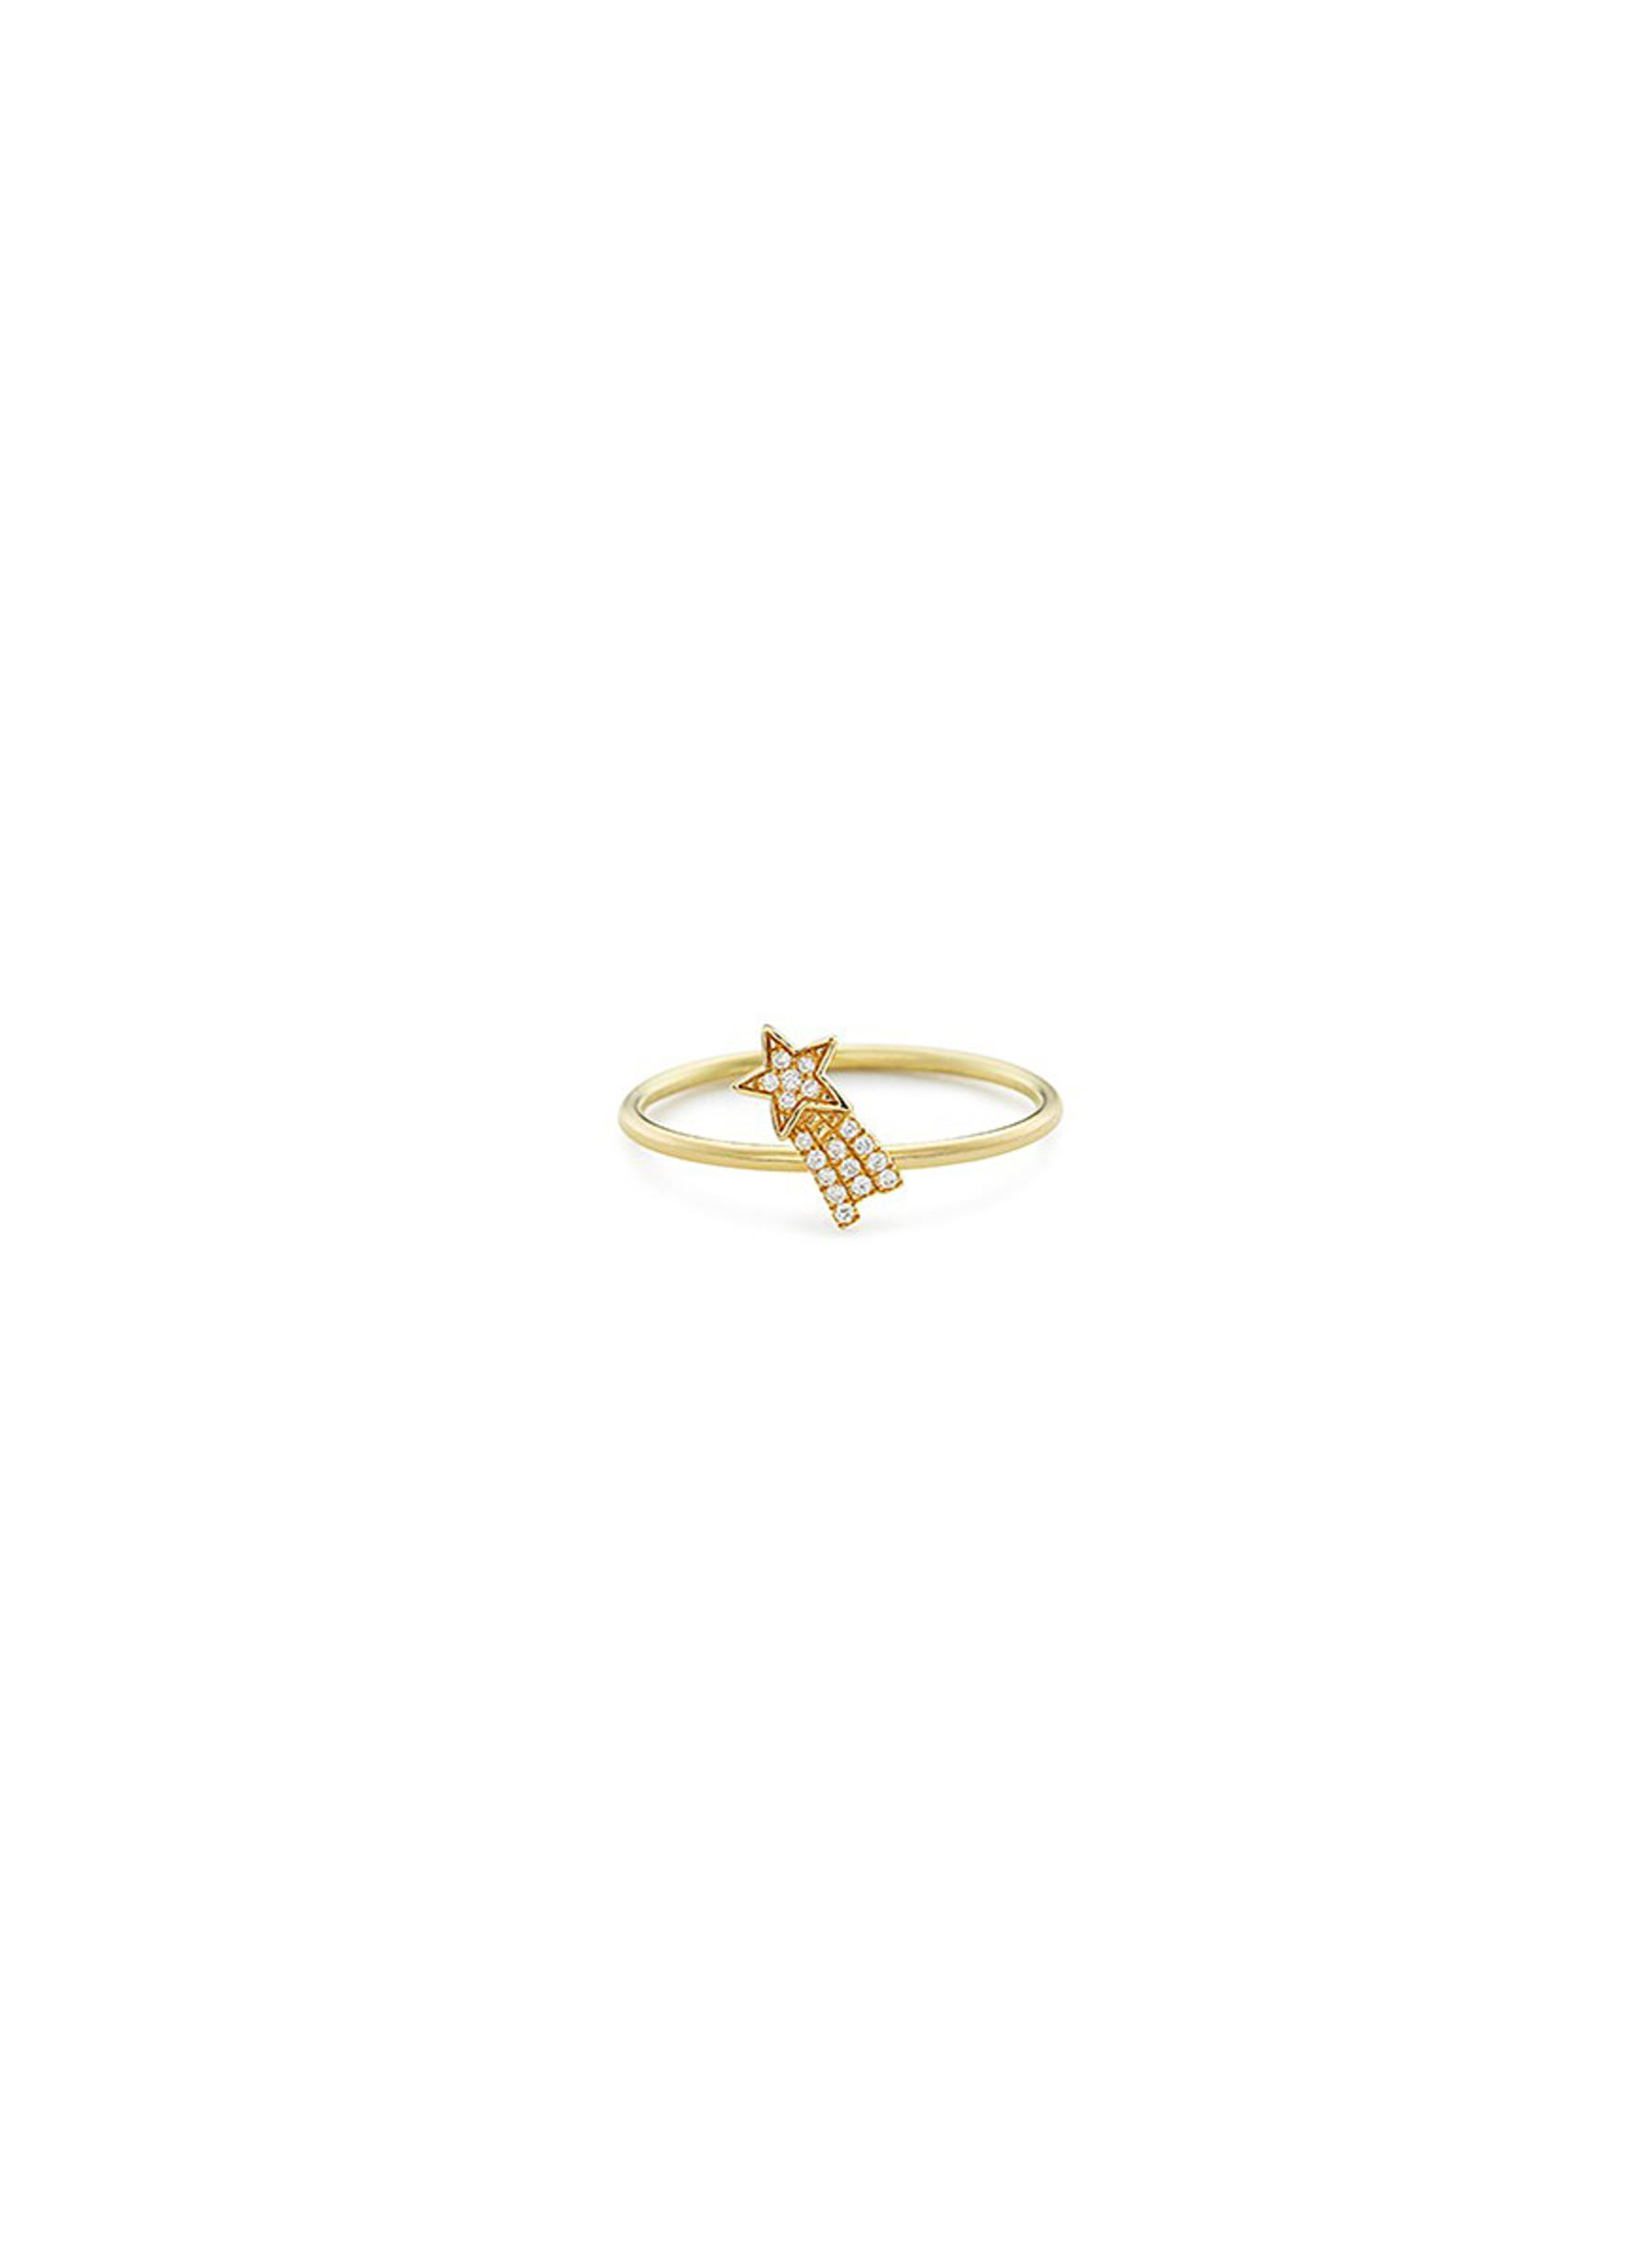 Diamond 18k yellow gold shooting star ring